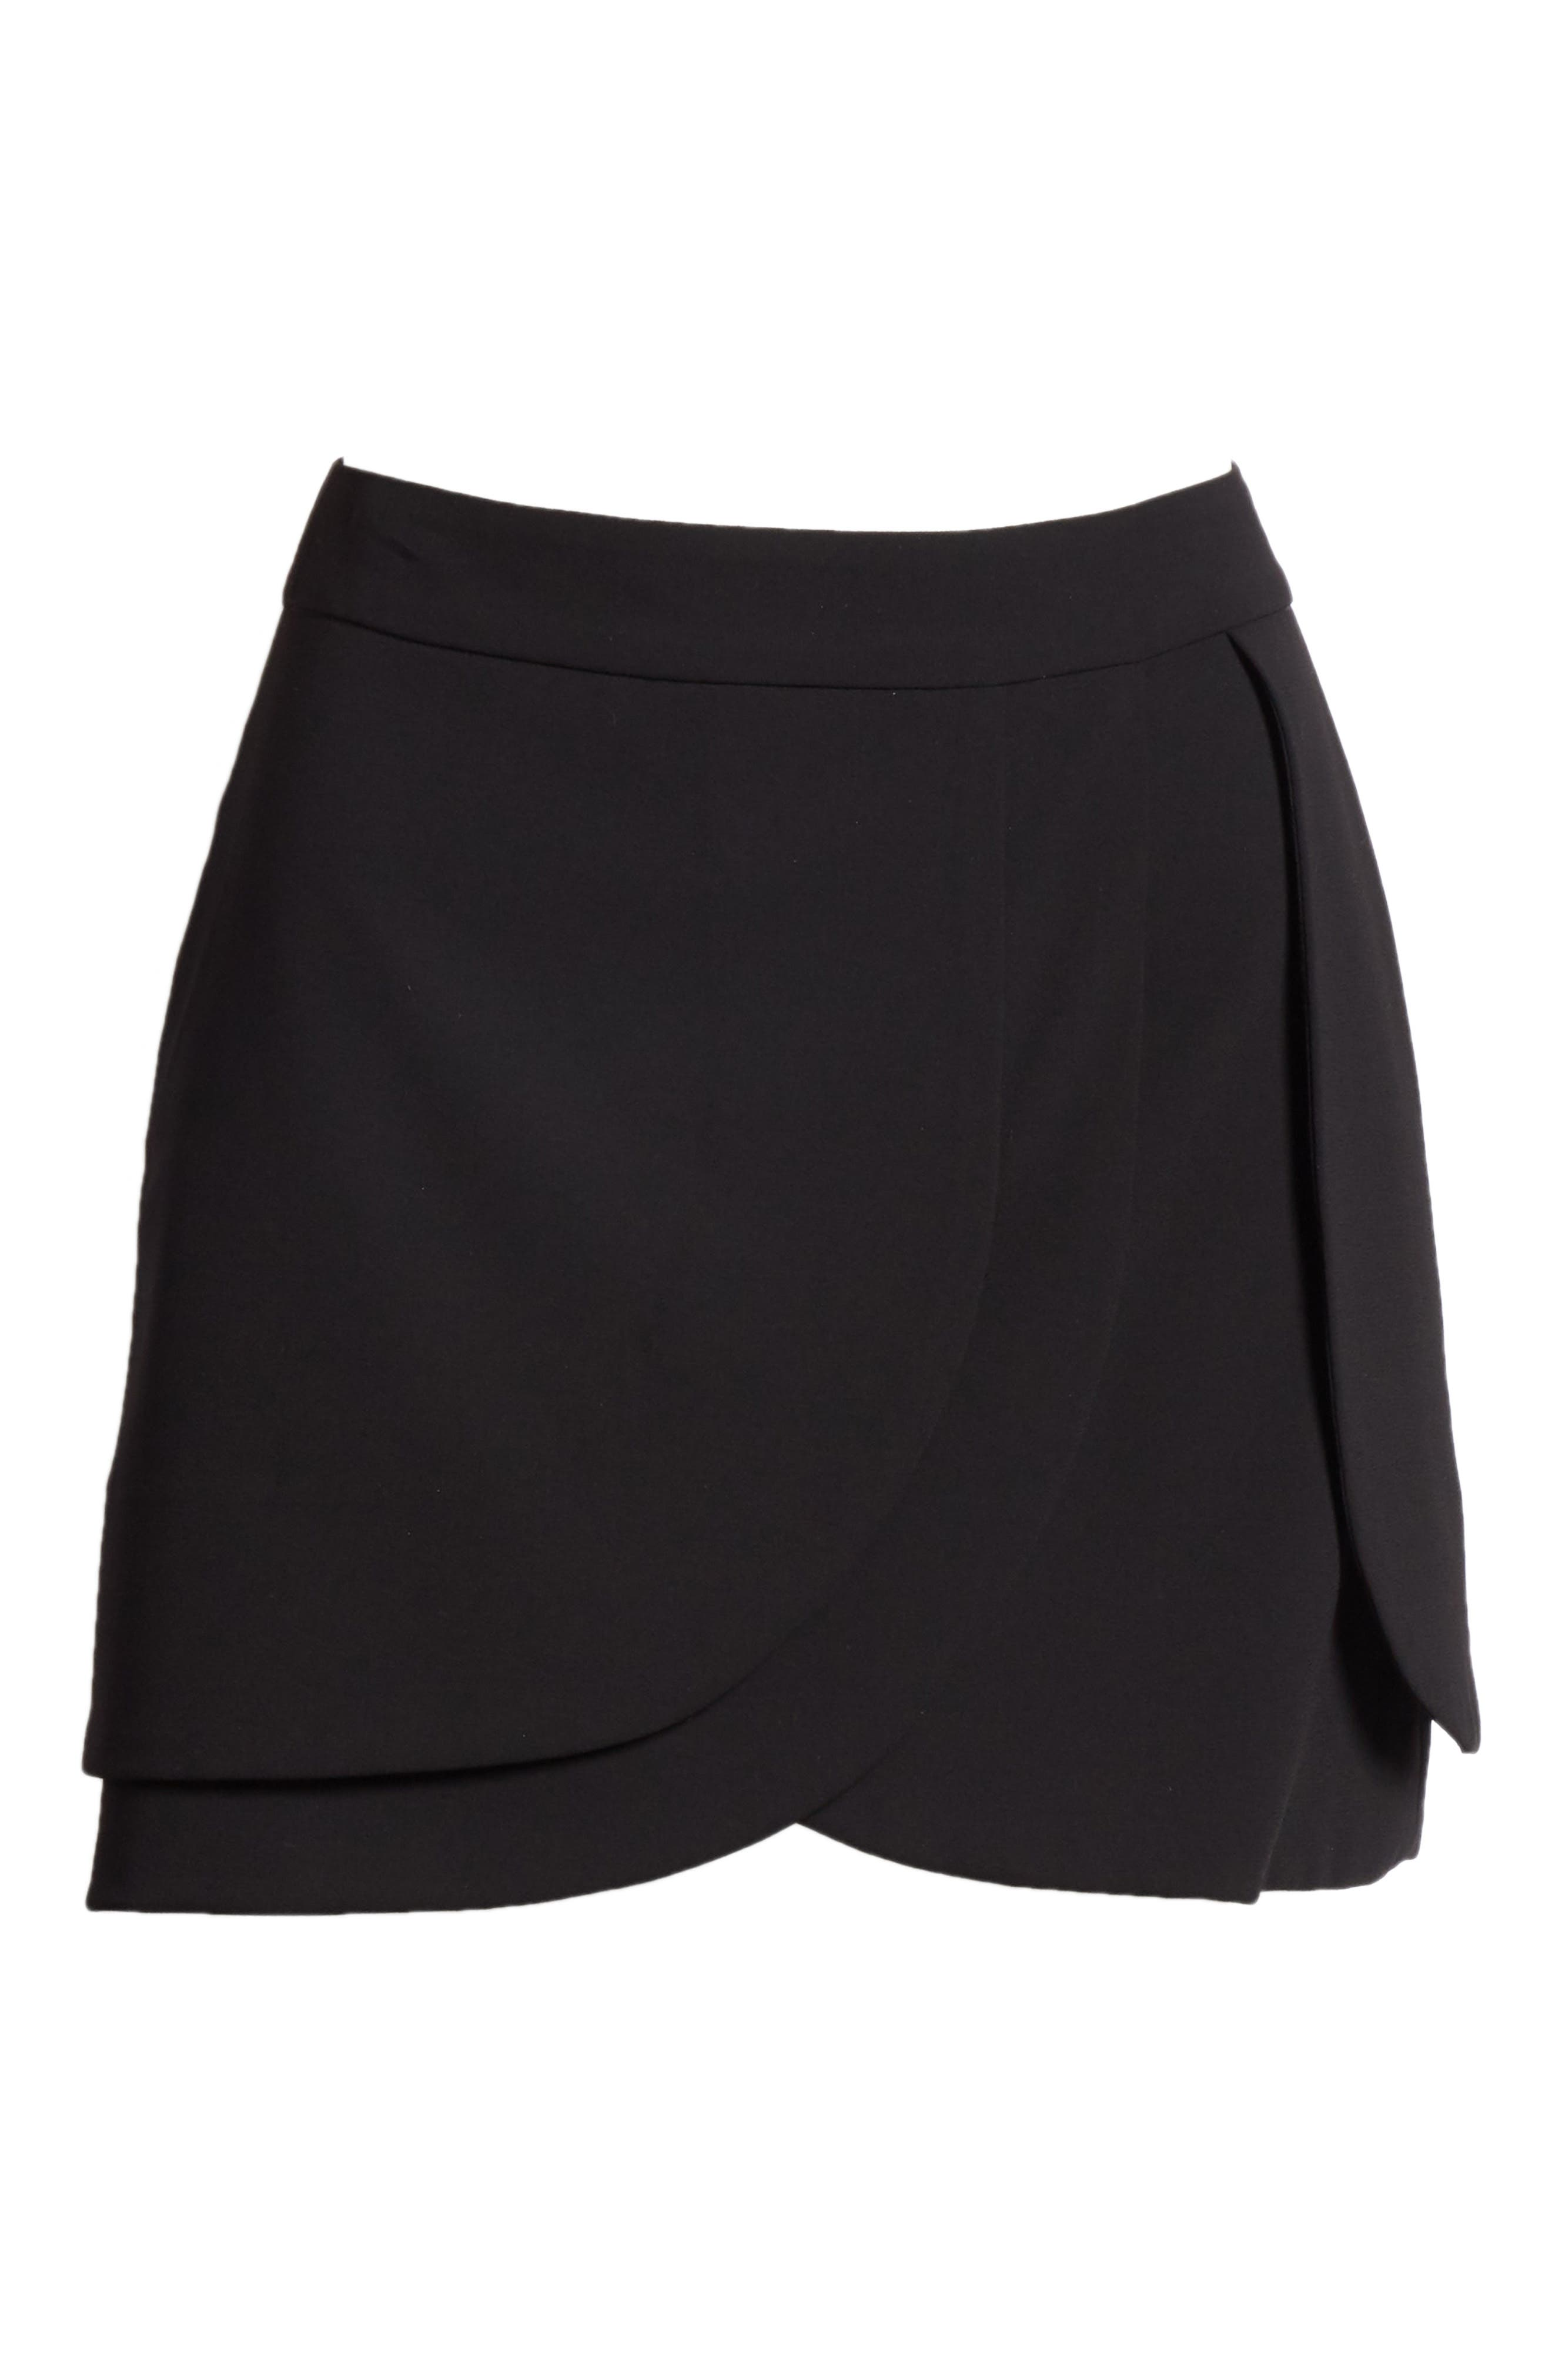 Nicolina Layered Tulip Miniskirt,                             Alternate thumbnail 6, color,                             BLACK